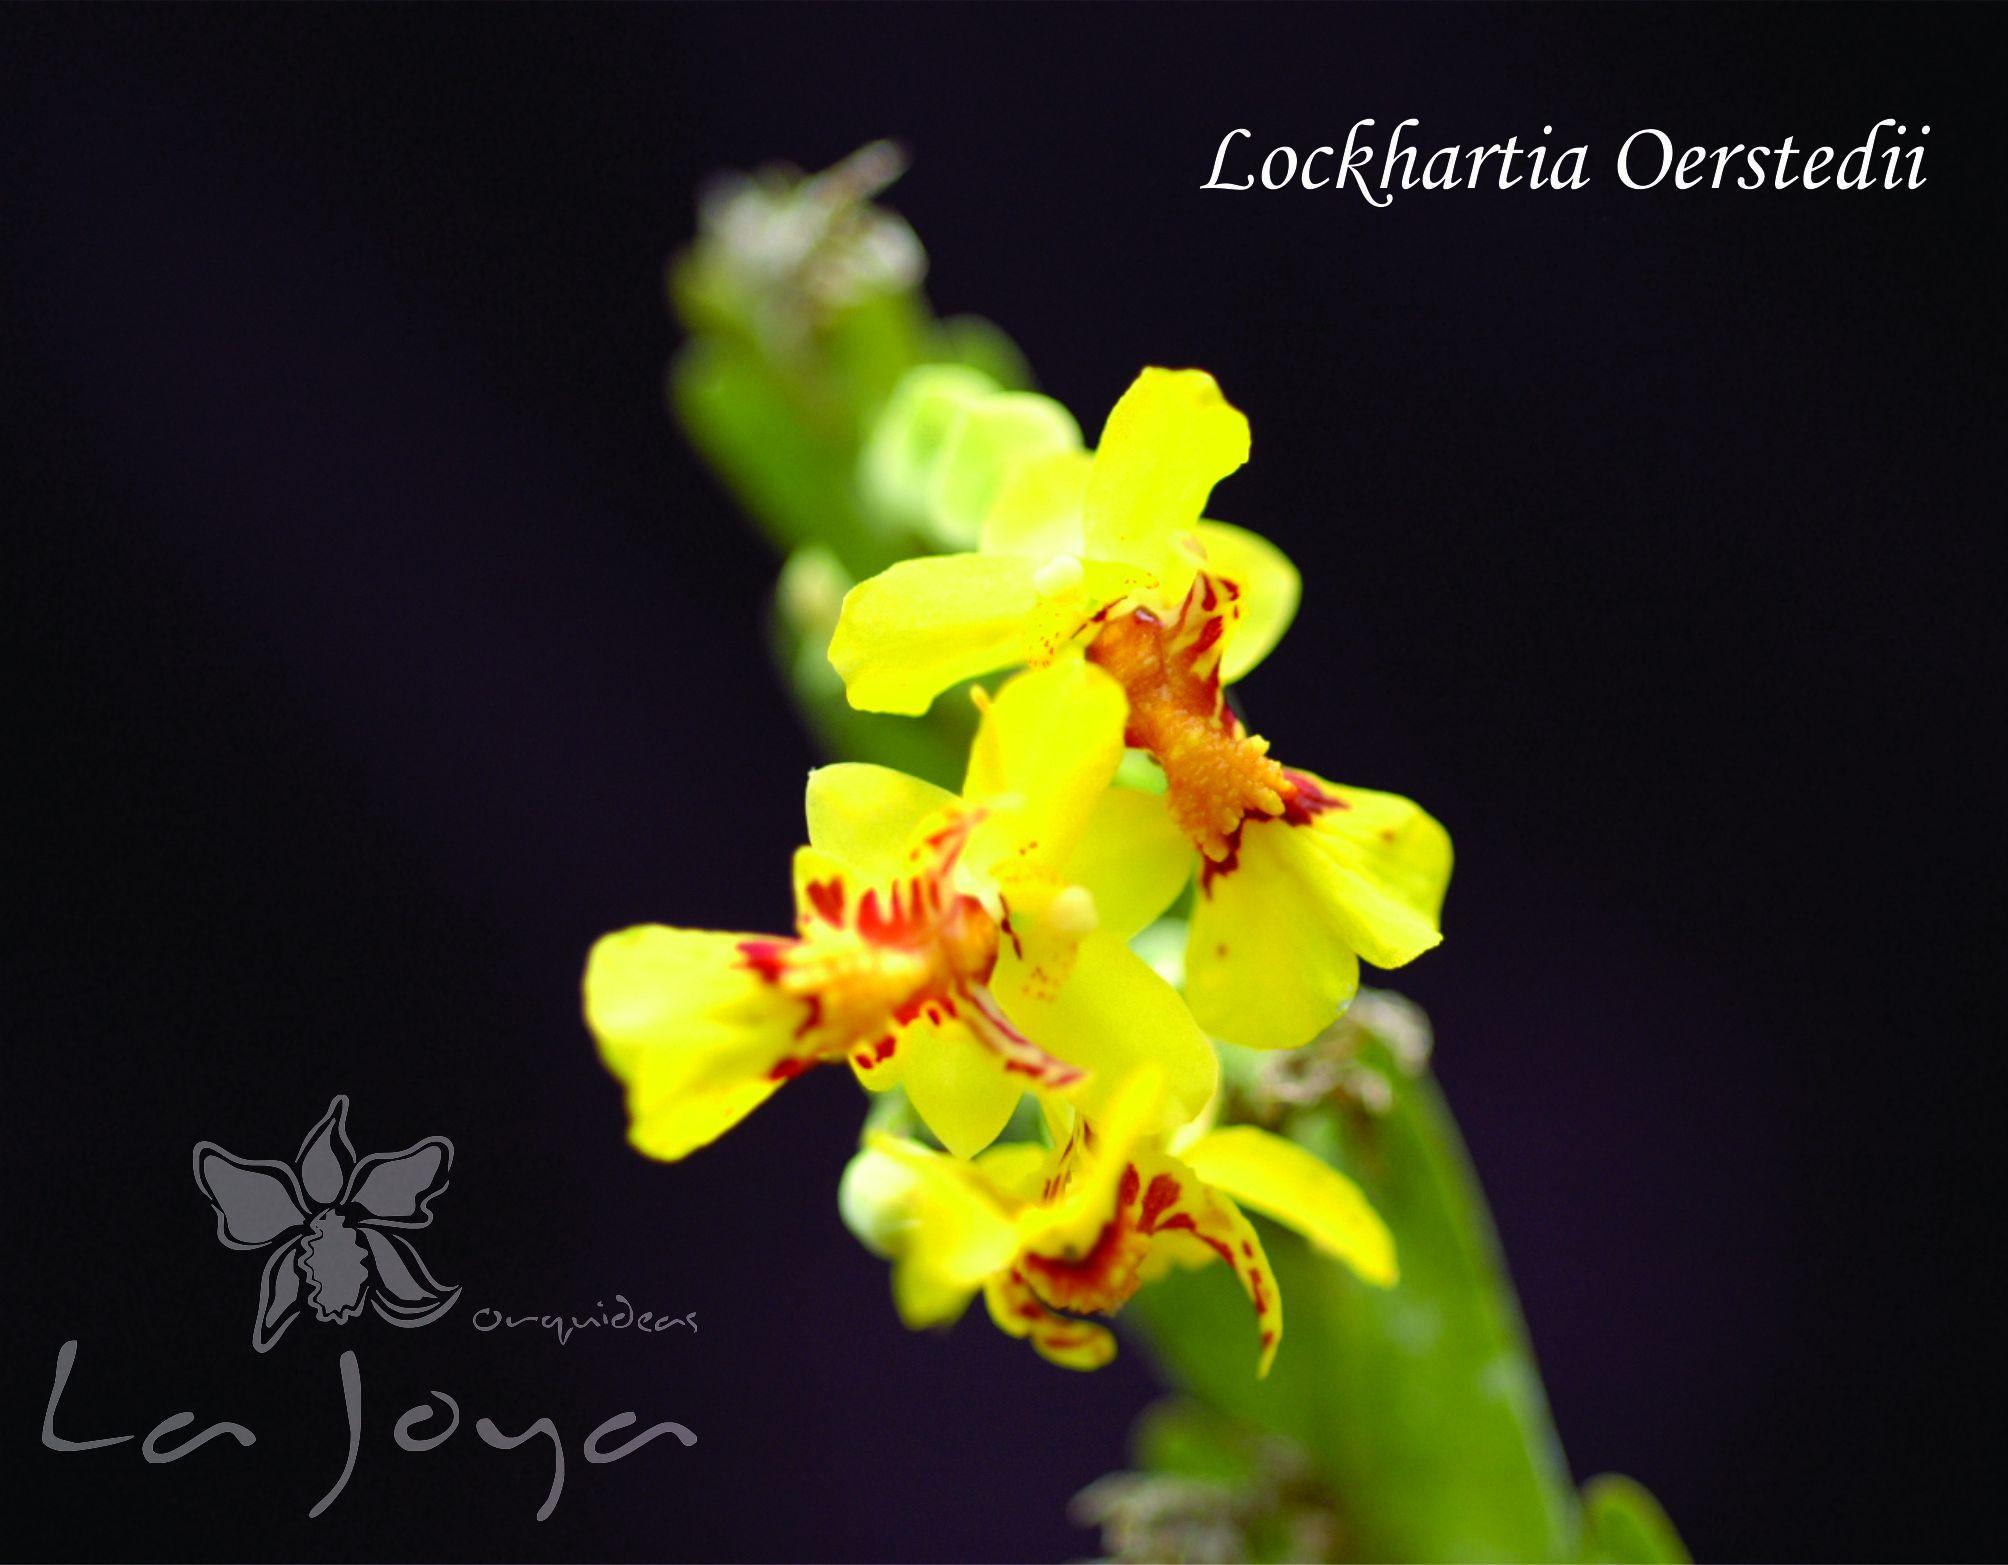 Lockhartia Oerstedii